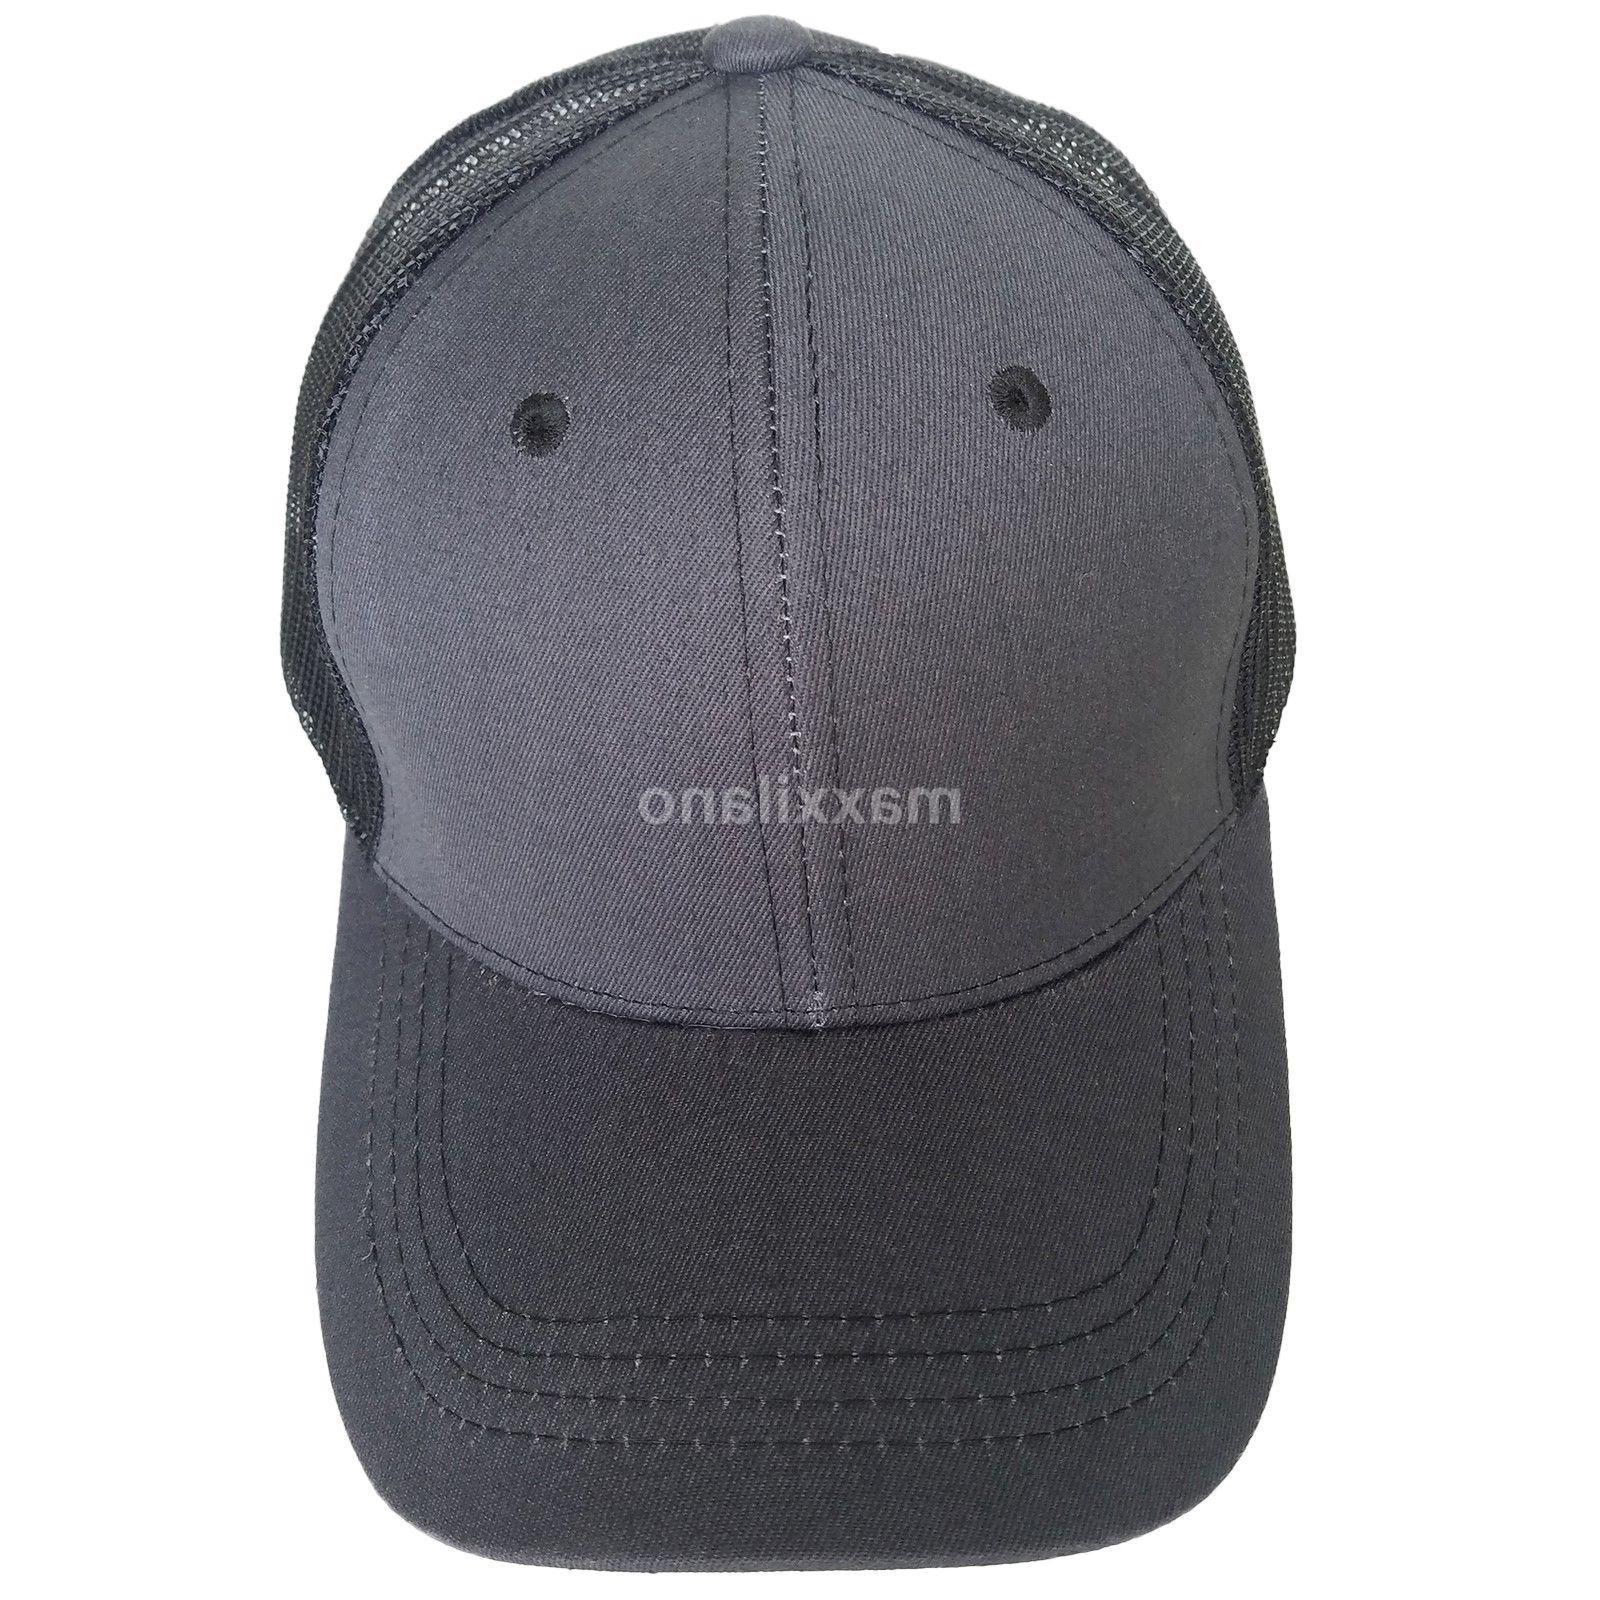 Trucker Cotton Mesh Solid Washed Polo Baseball Cap Visor Mens